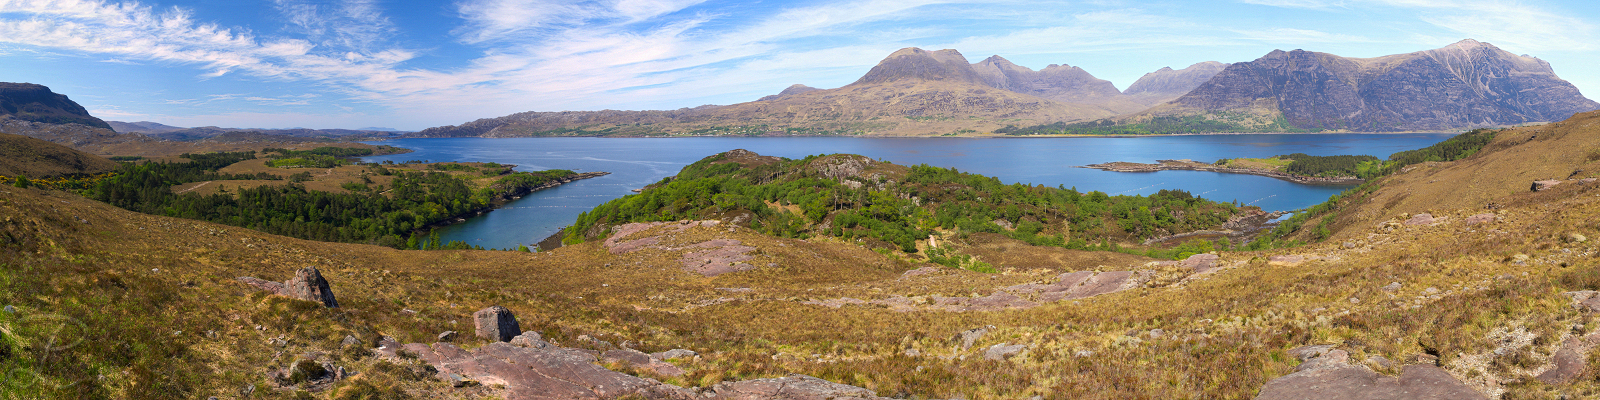 Upper Loch Torridon Panorama by da-phil